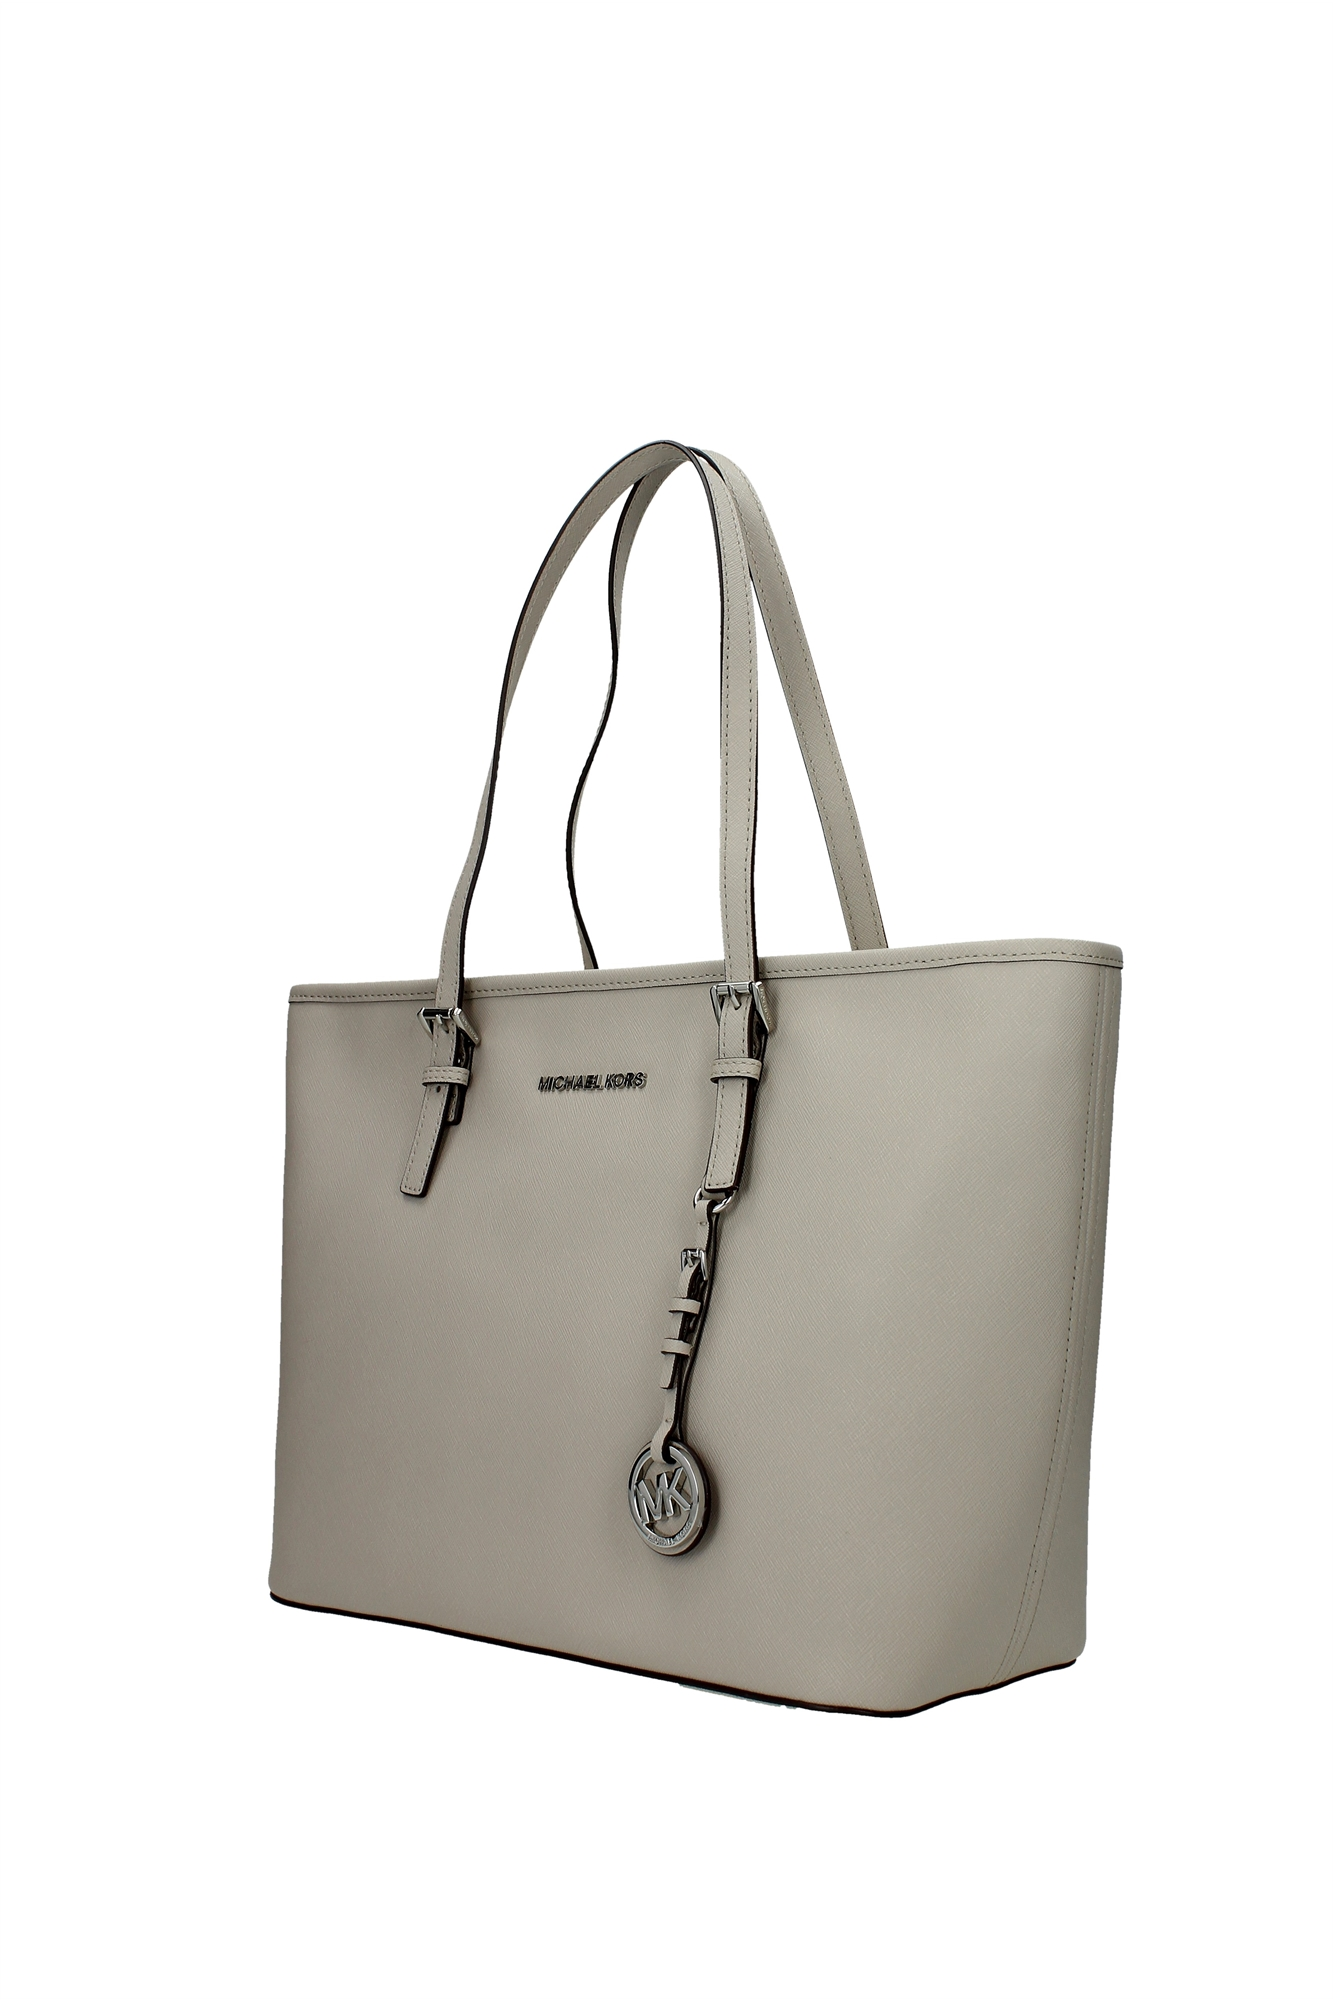 Original Home Gt Bags GtWomenBagsMichael Michael Kors Cynthia Tote Bag Khaki